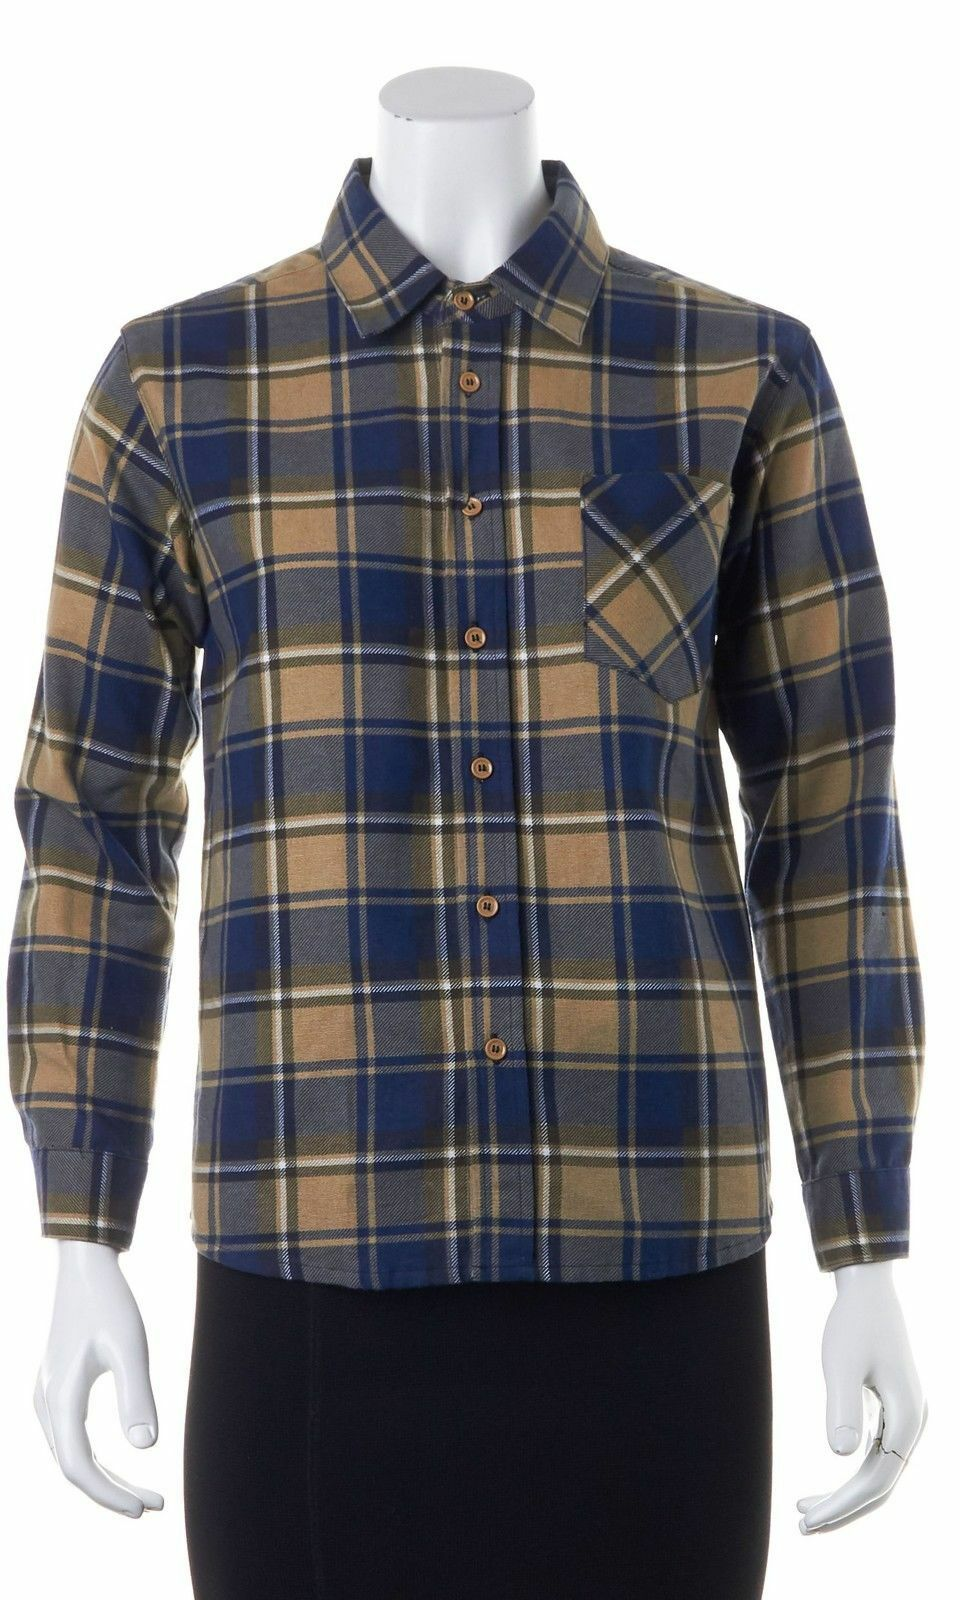 NWT See by CHLOE plaid shirt, blouse,top; 100% cotton, Navy Tan Größe 6, S